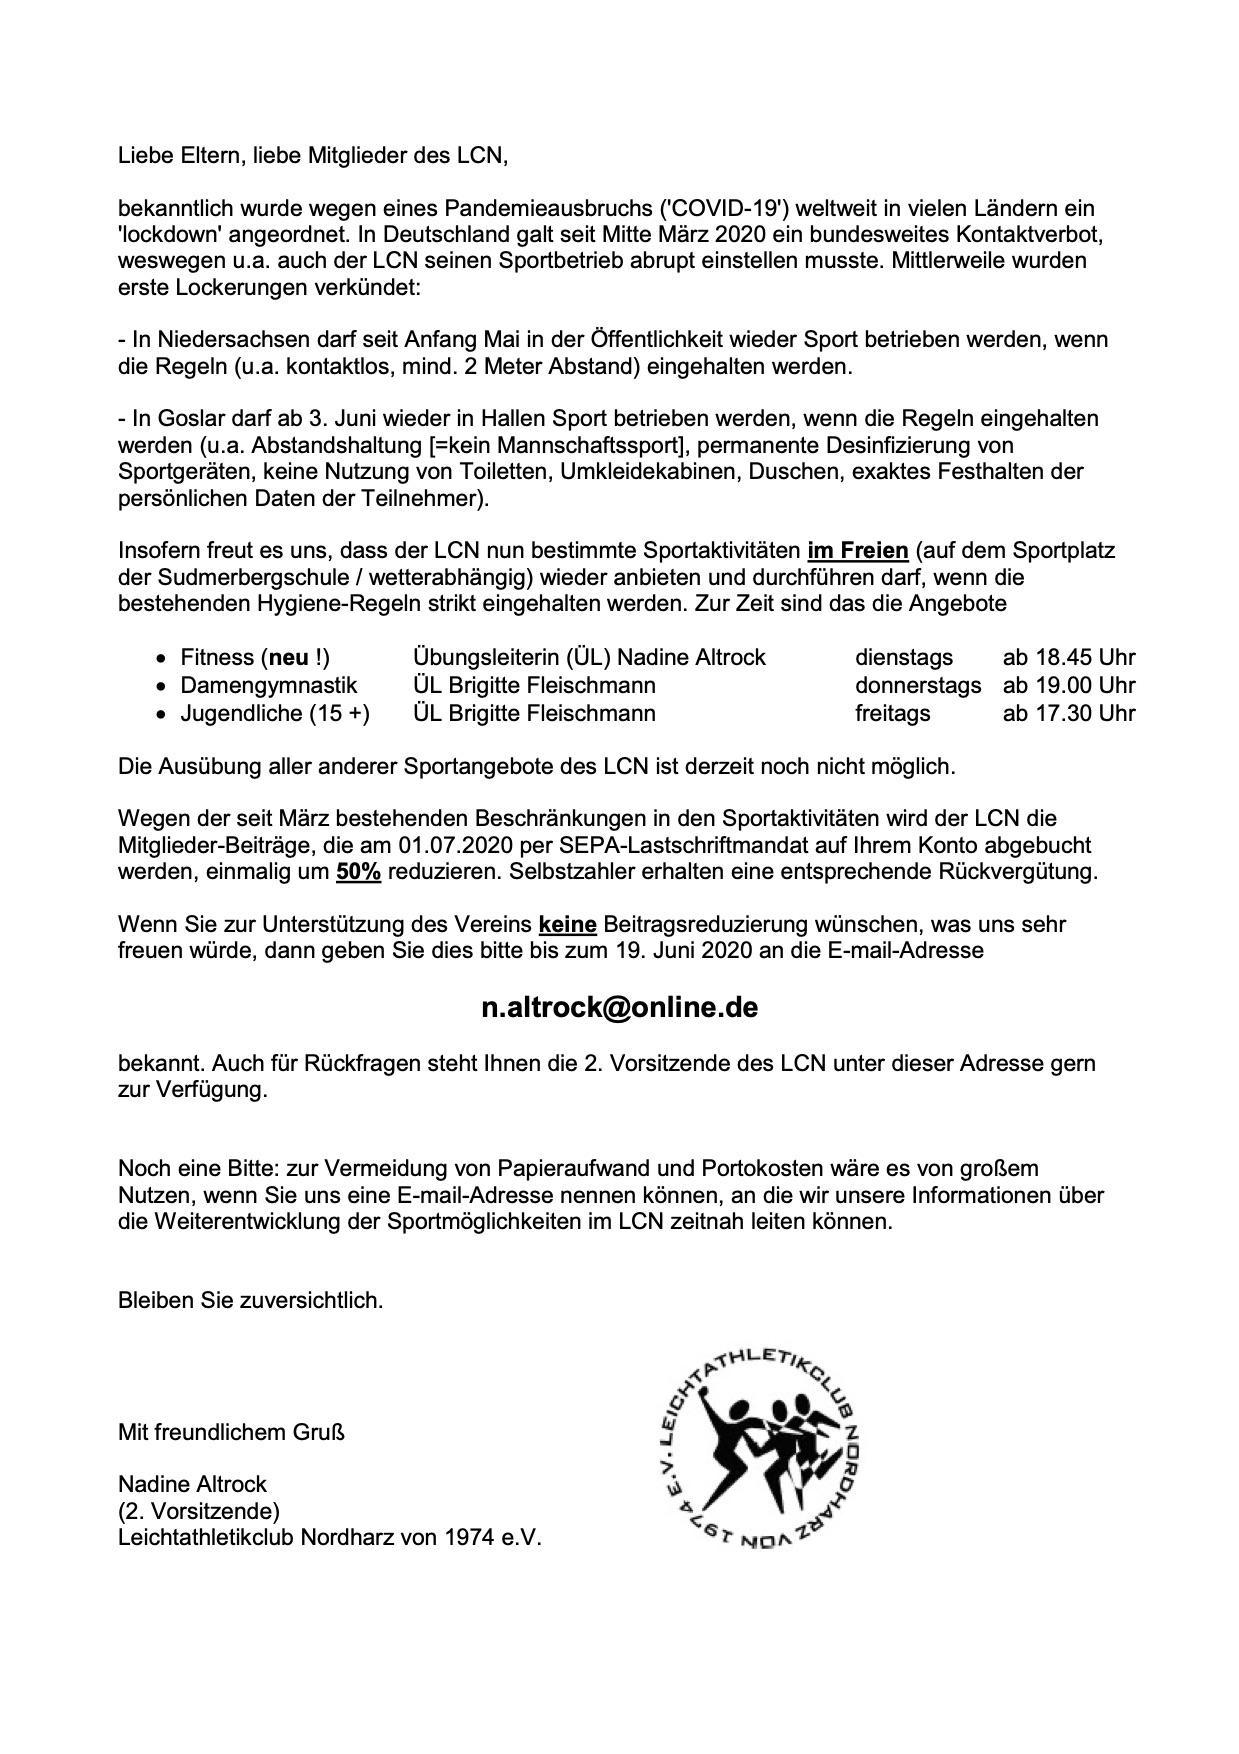 2020-06-01, Brief_LCN-Mitglieder wg. Corona